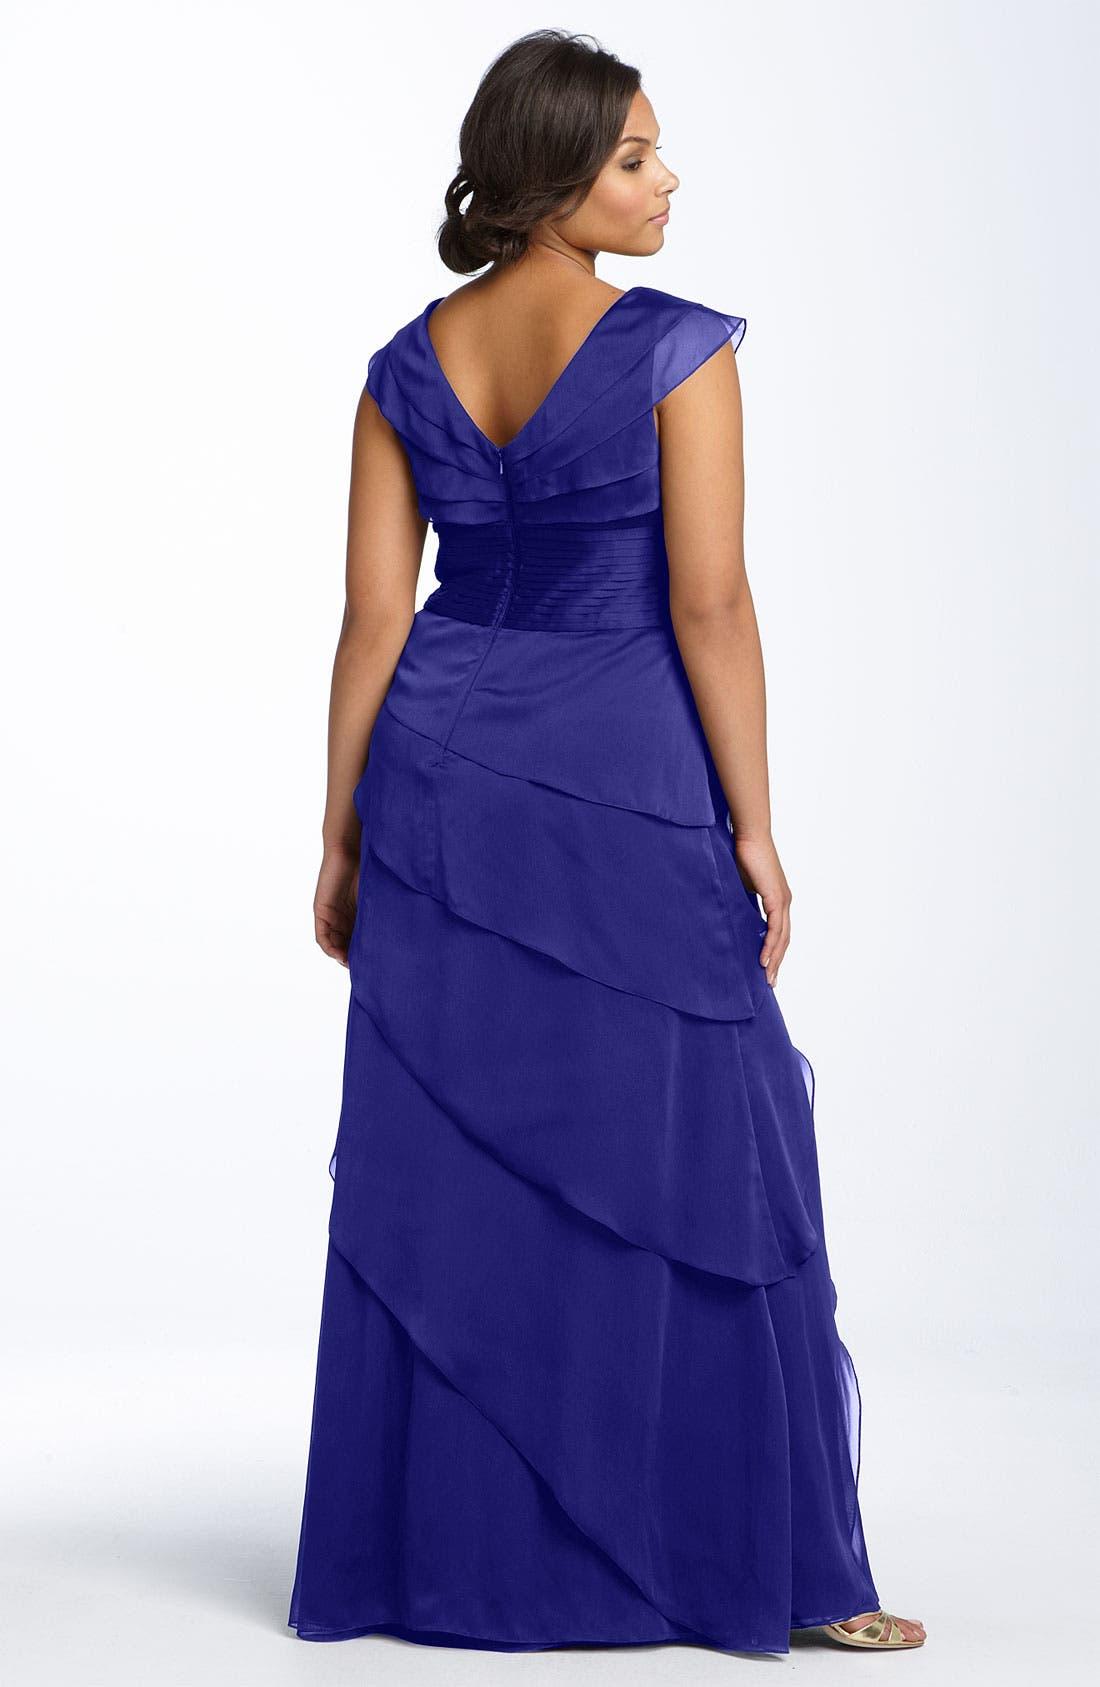 Alternate Image 2  - Adrianna Papell Iridescent Chiffon Petal Gown (Plus Size)